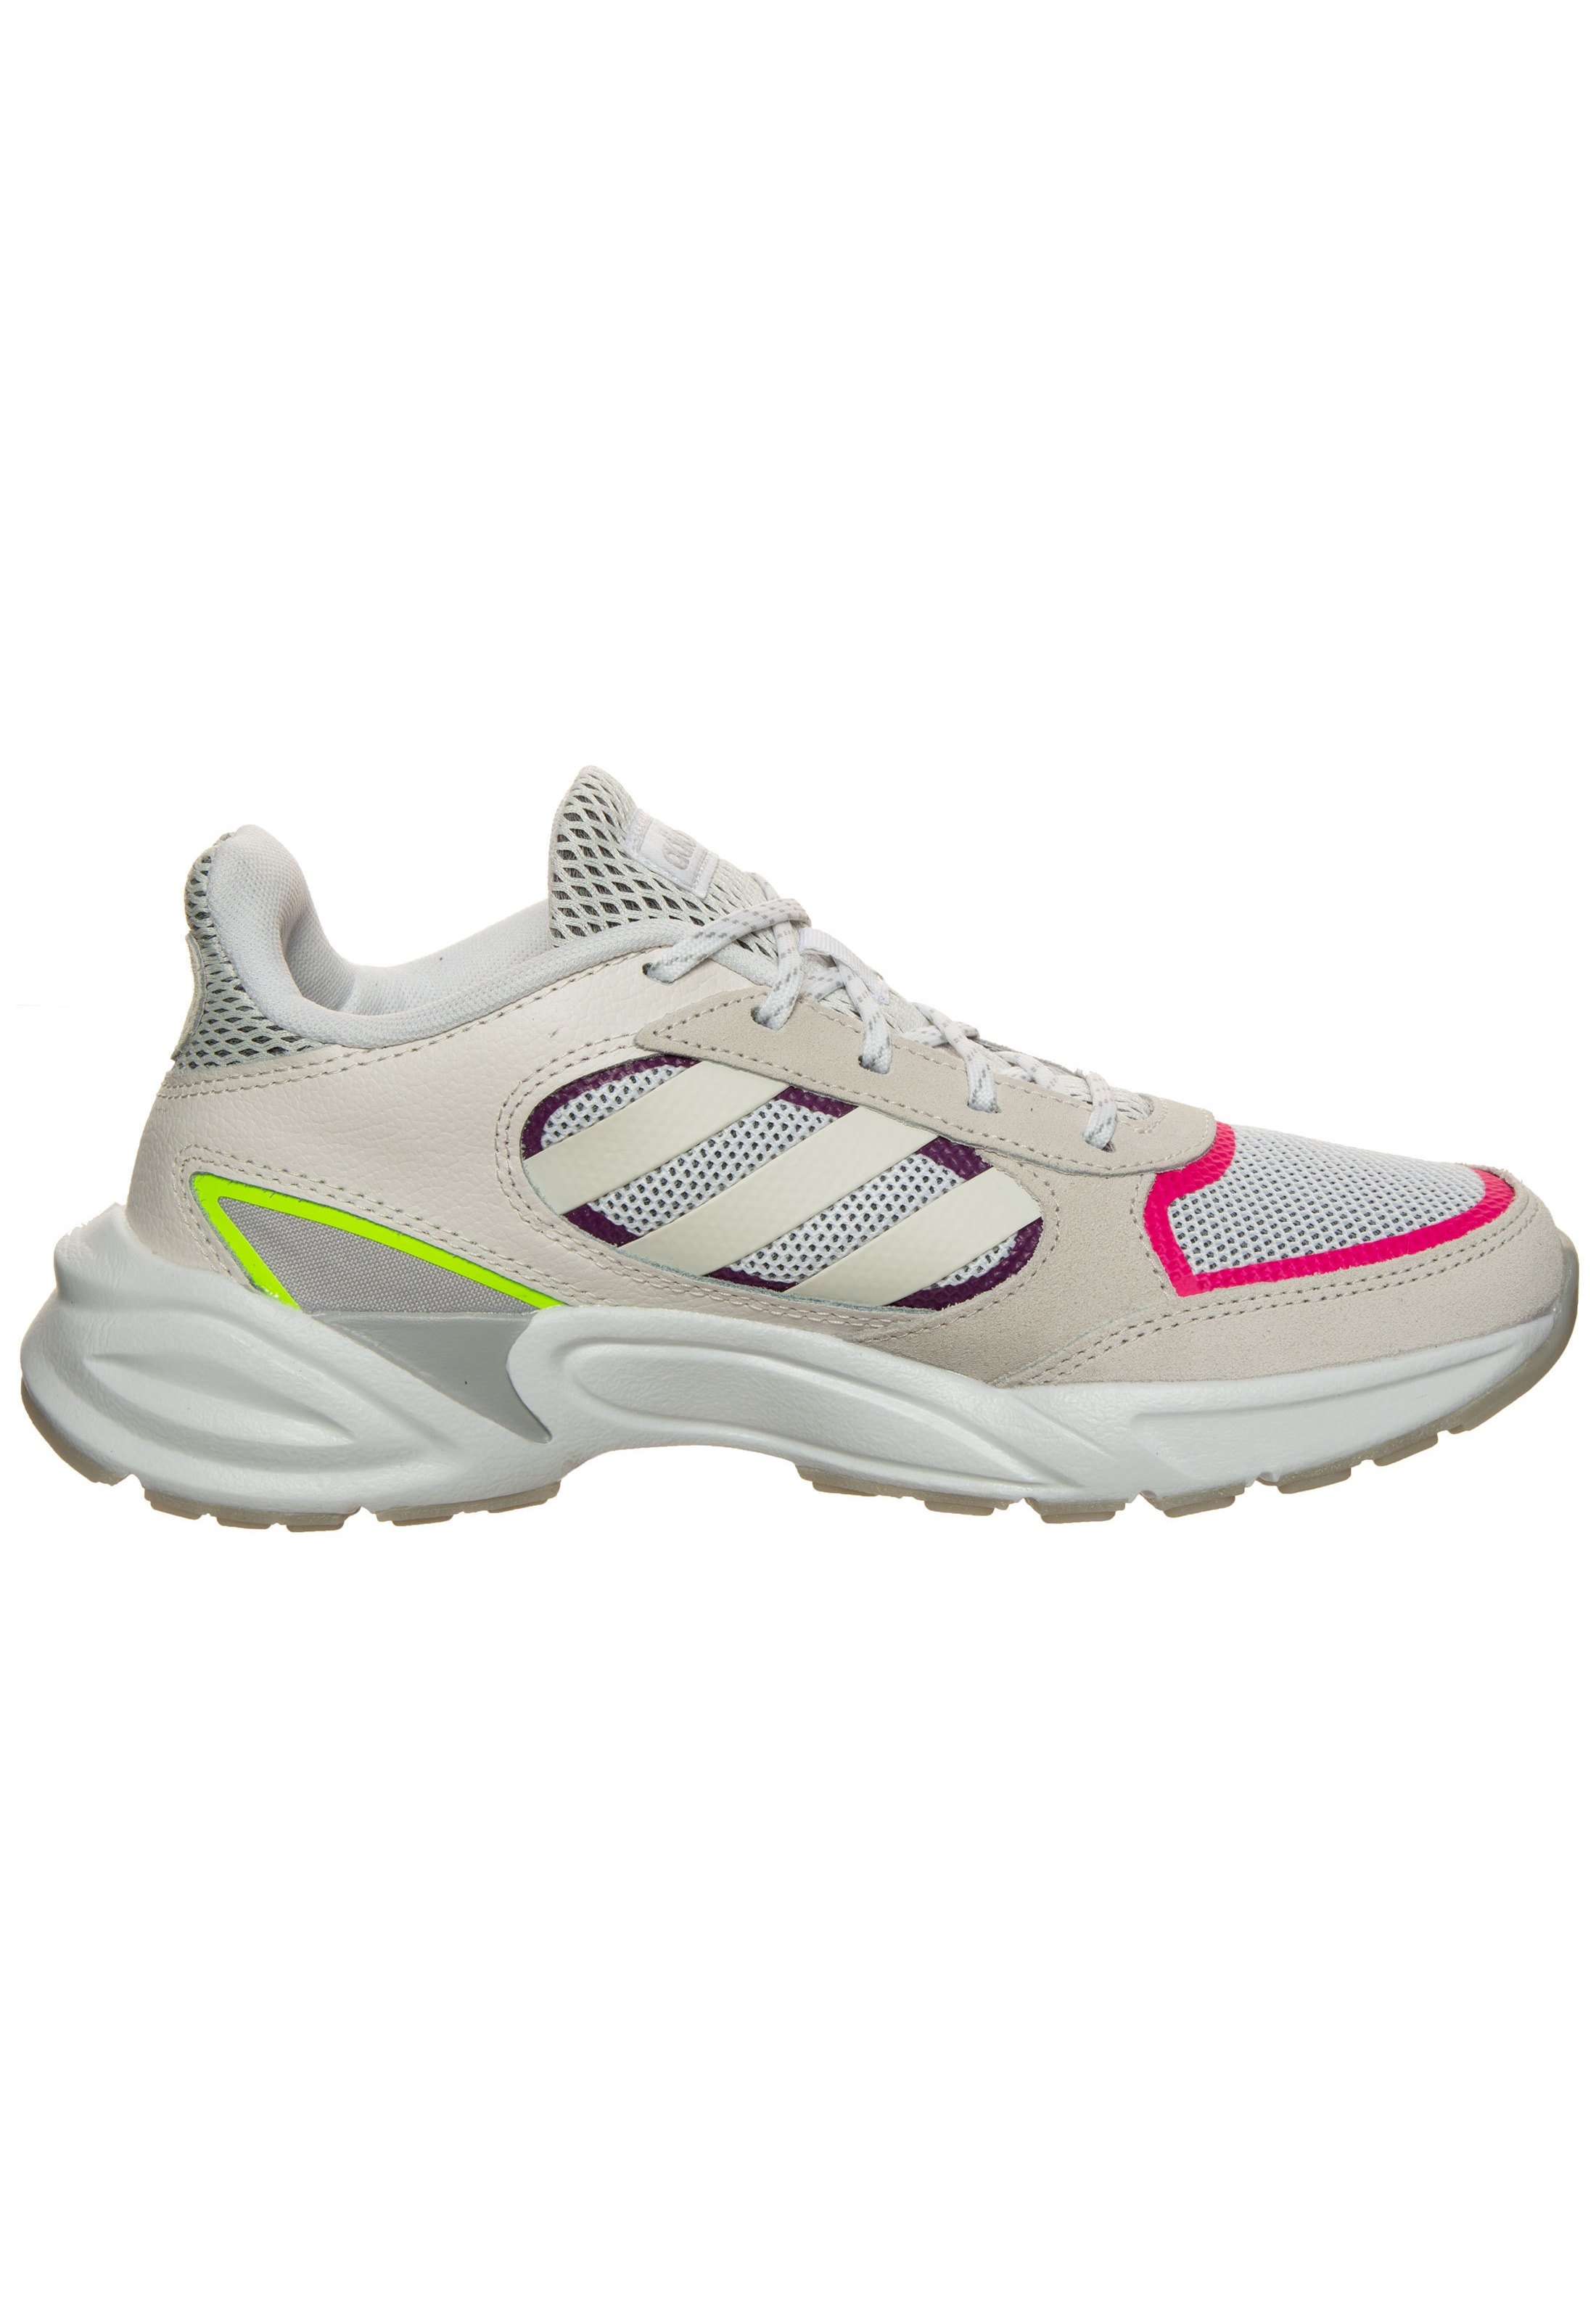 Adidas Performance 90s Valasion Laufschuh Damen - Baskets Basses Closh White/grey